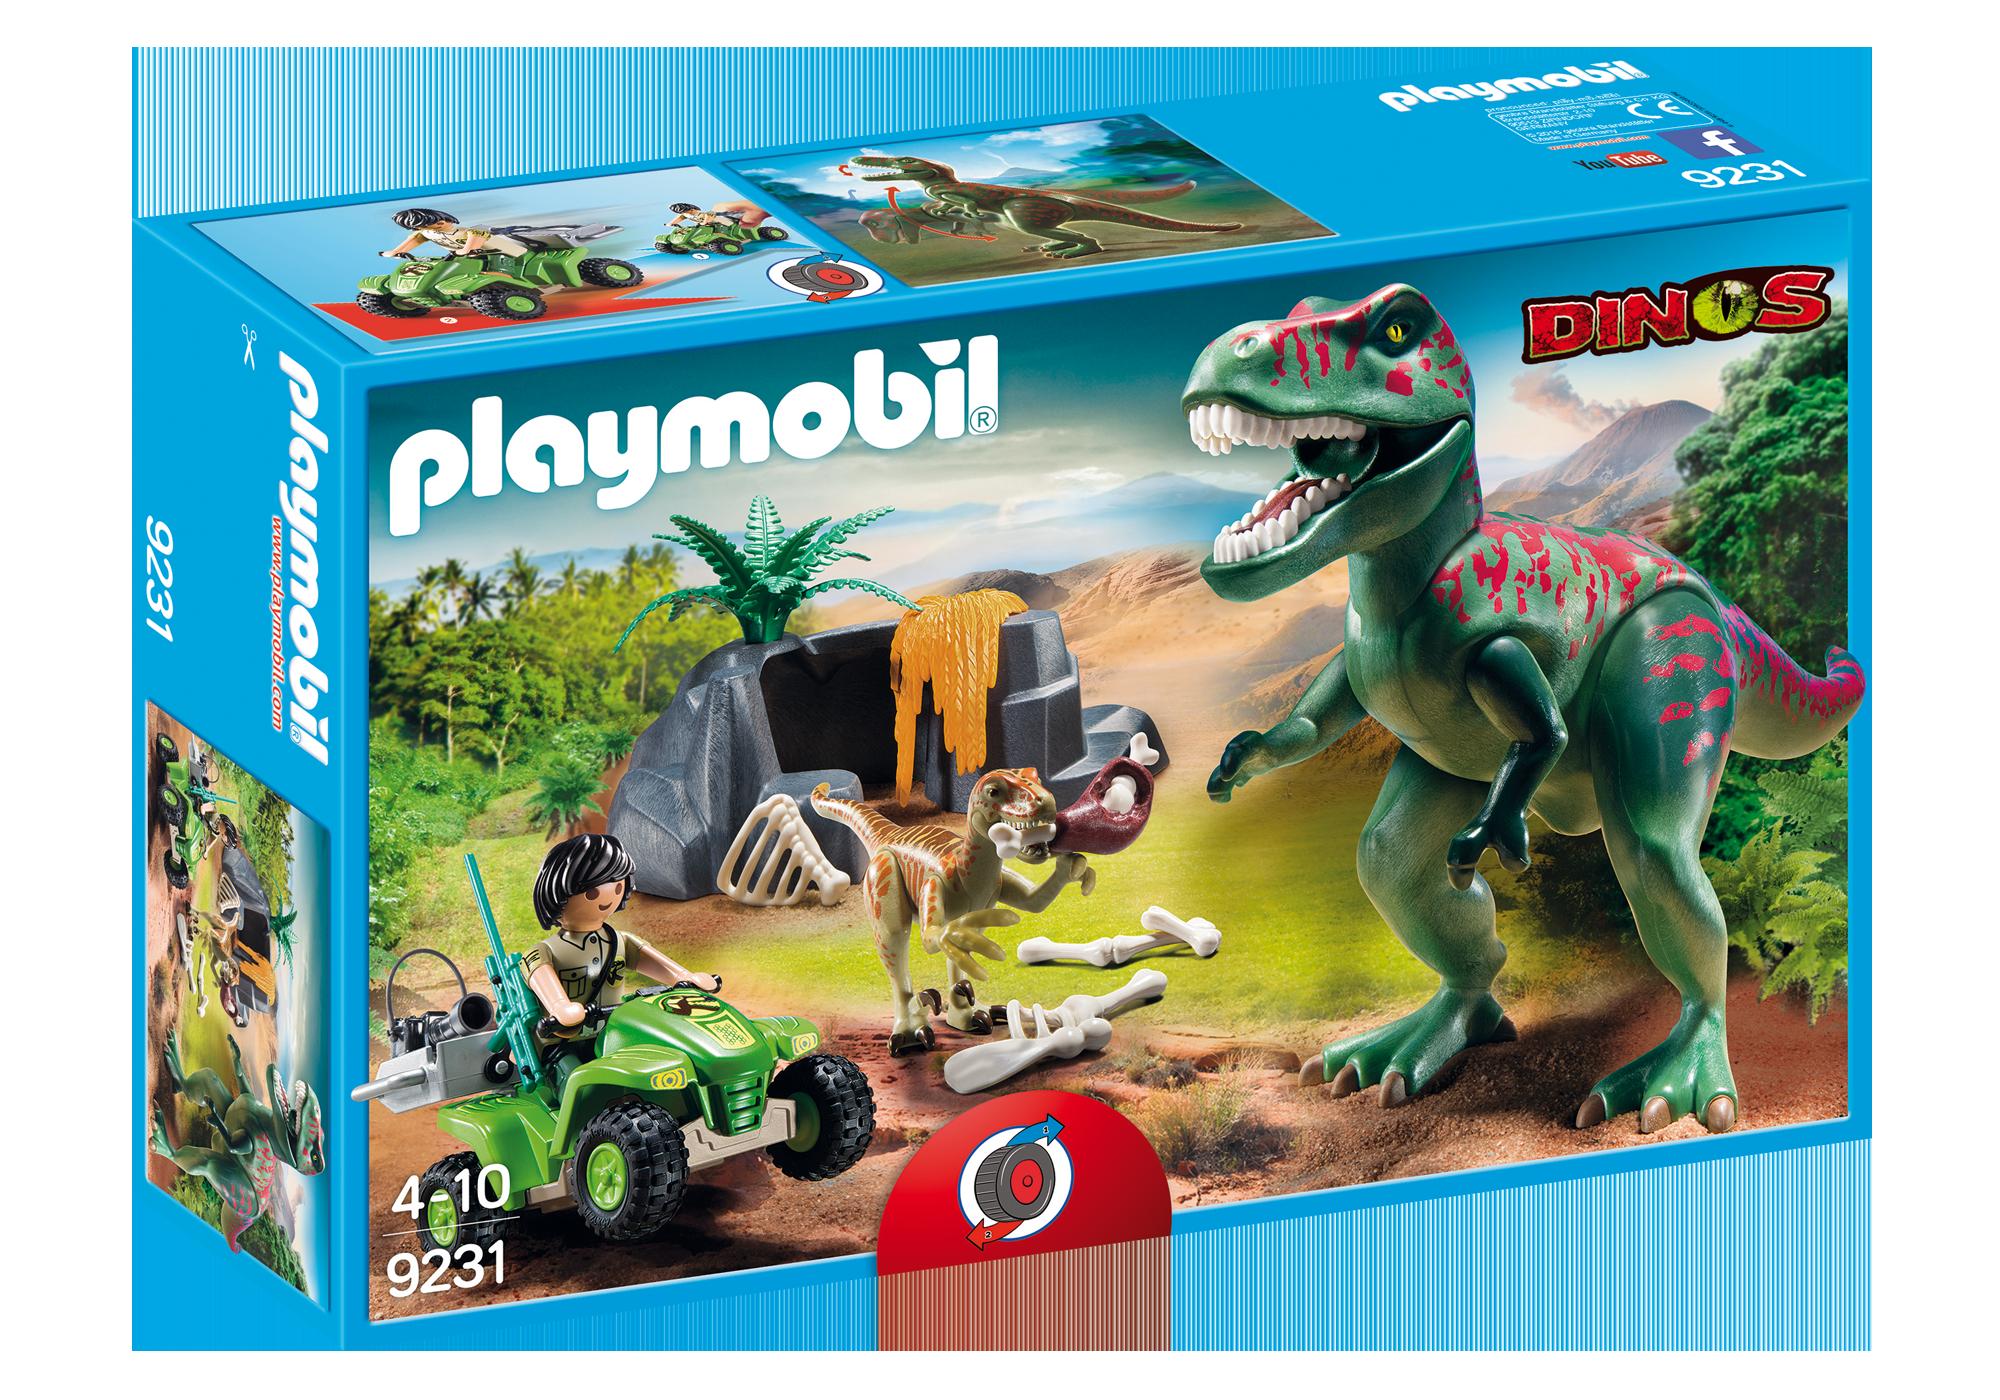 http://media.playmobil.com/i/playmobil/9231_product_box_front